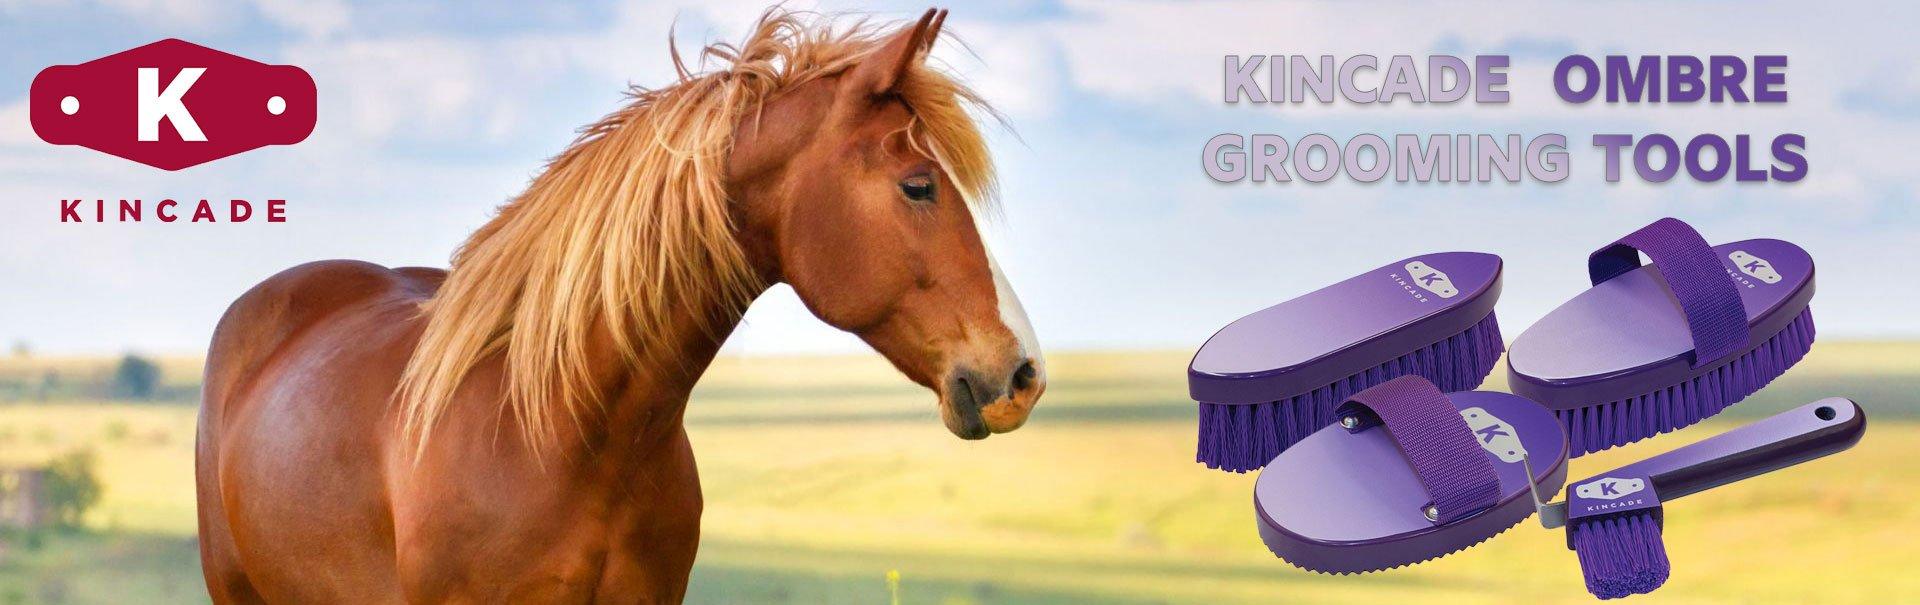 Kincade Ombre Grooming Tools